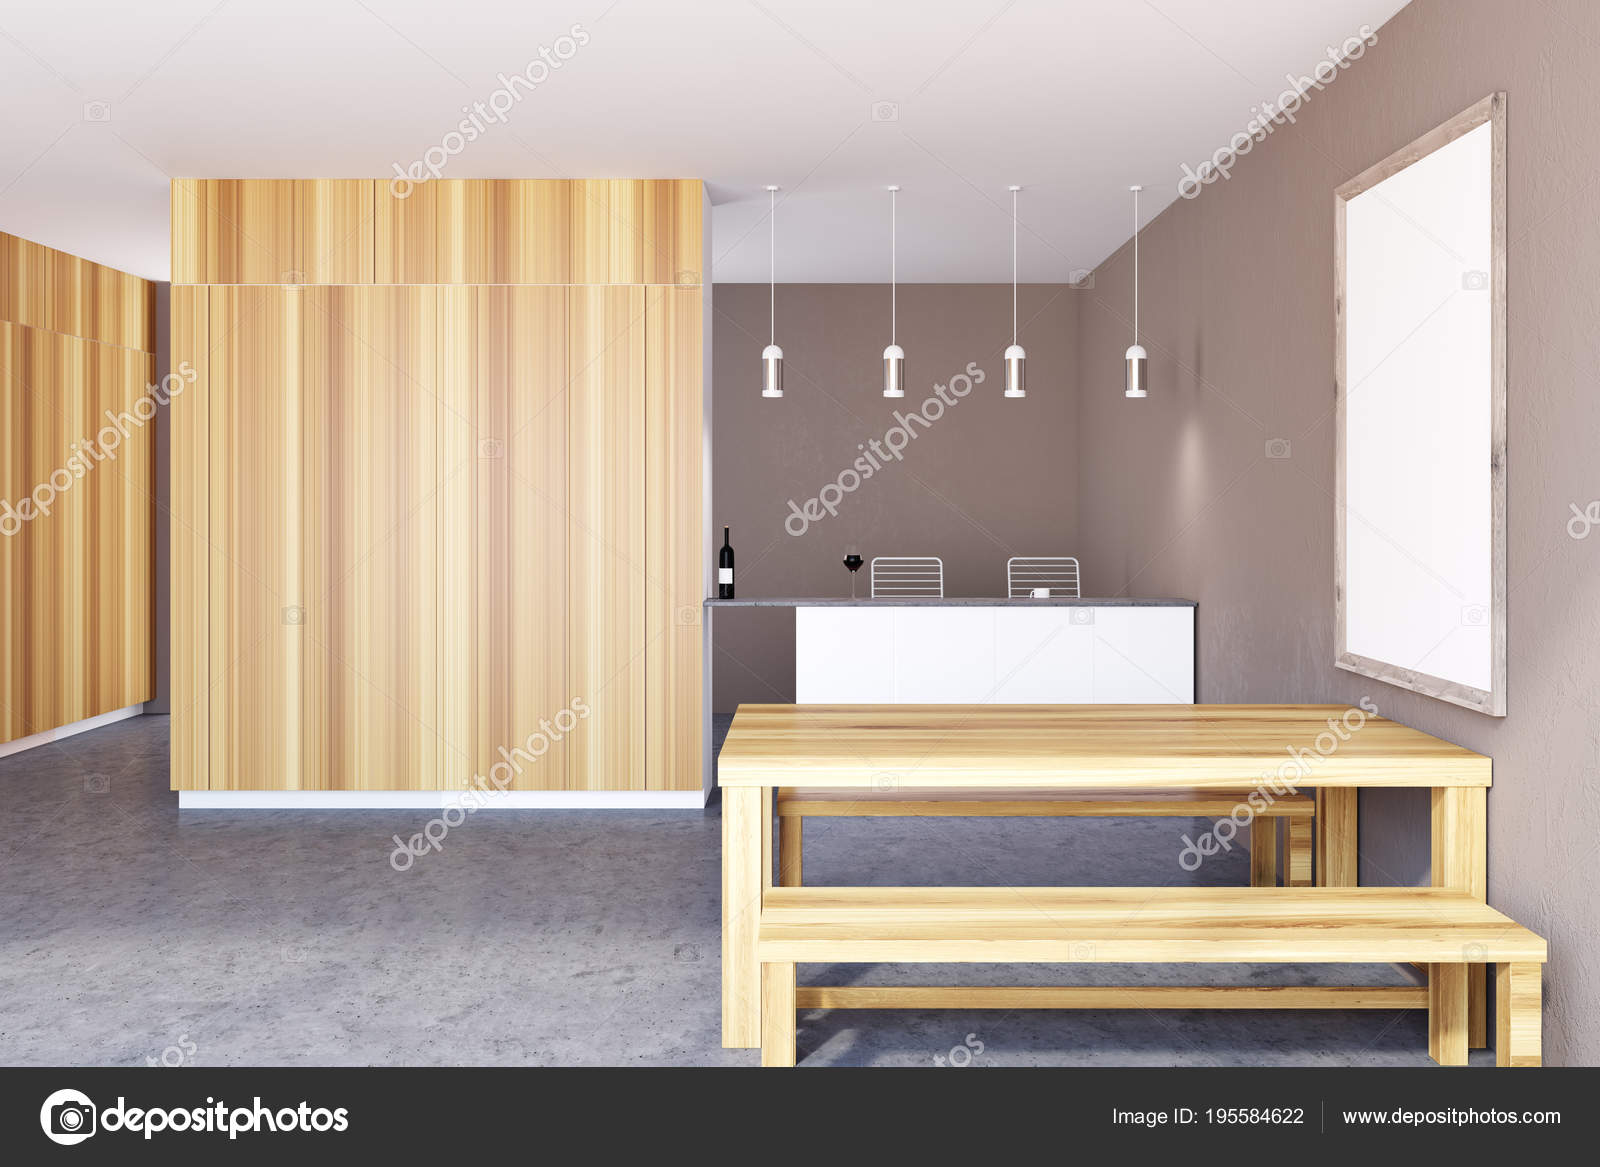 bench for kitchen table painting cabinets cost 乡村厨房内饰 框架海报 墙壁 图库照片 c denisismagilov 195584622 乡村餐厅内部有一张巨大的桌子 两个长凳和一张竖着的框架海报在墙上 一堵空墙 3d 渲染模拟 照片作者denisismagilov